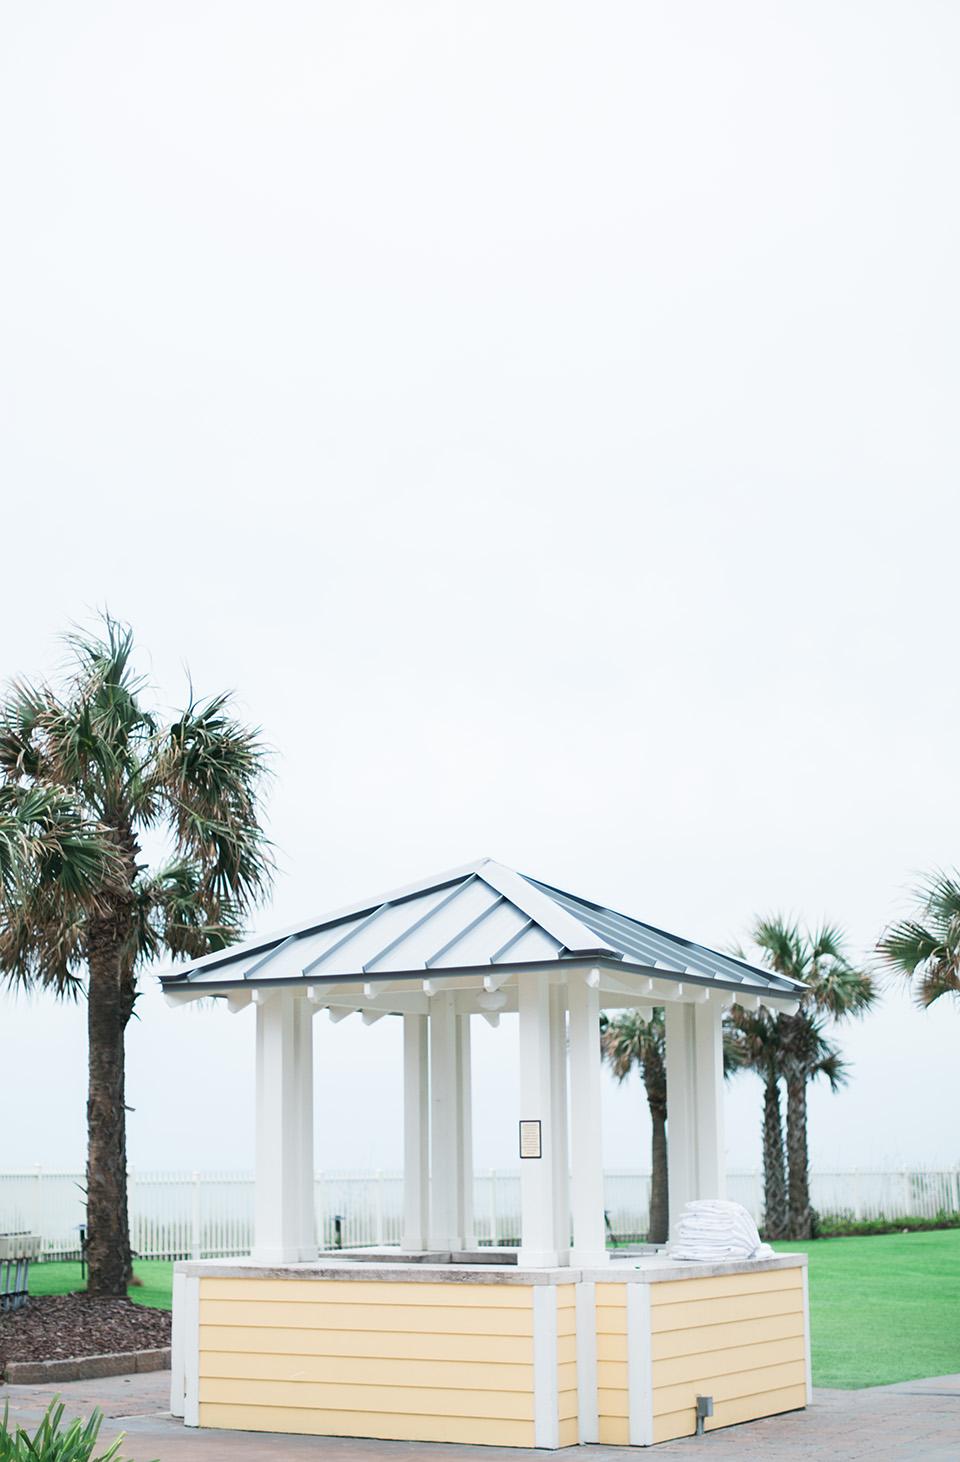 Image of a coastal pavilion, light yellow,  at the Omni Amelia Island Plantation Resort.